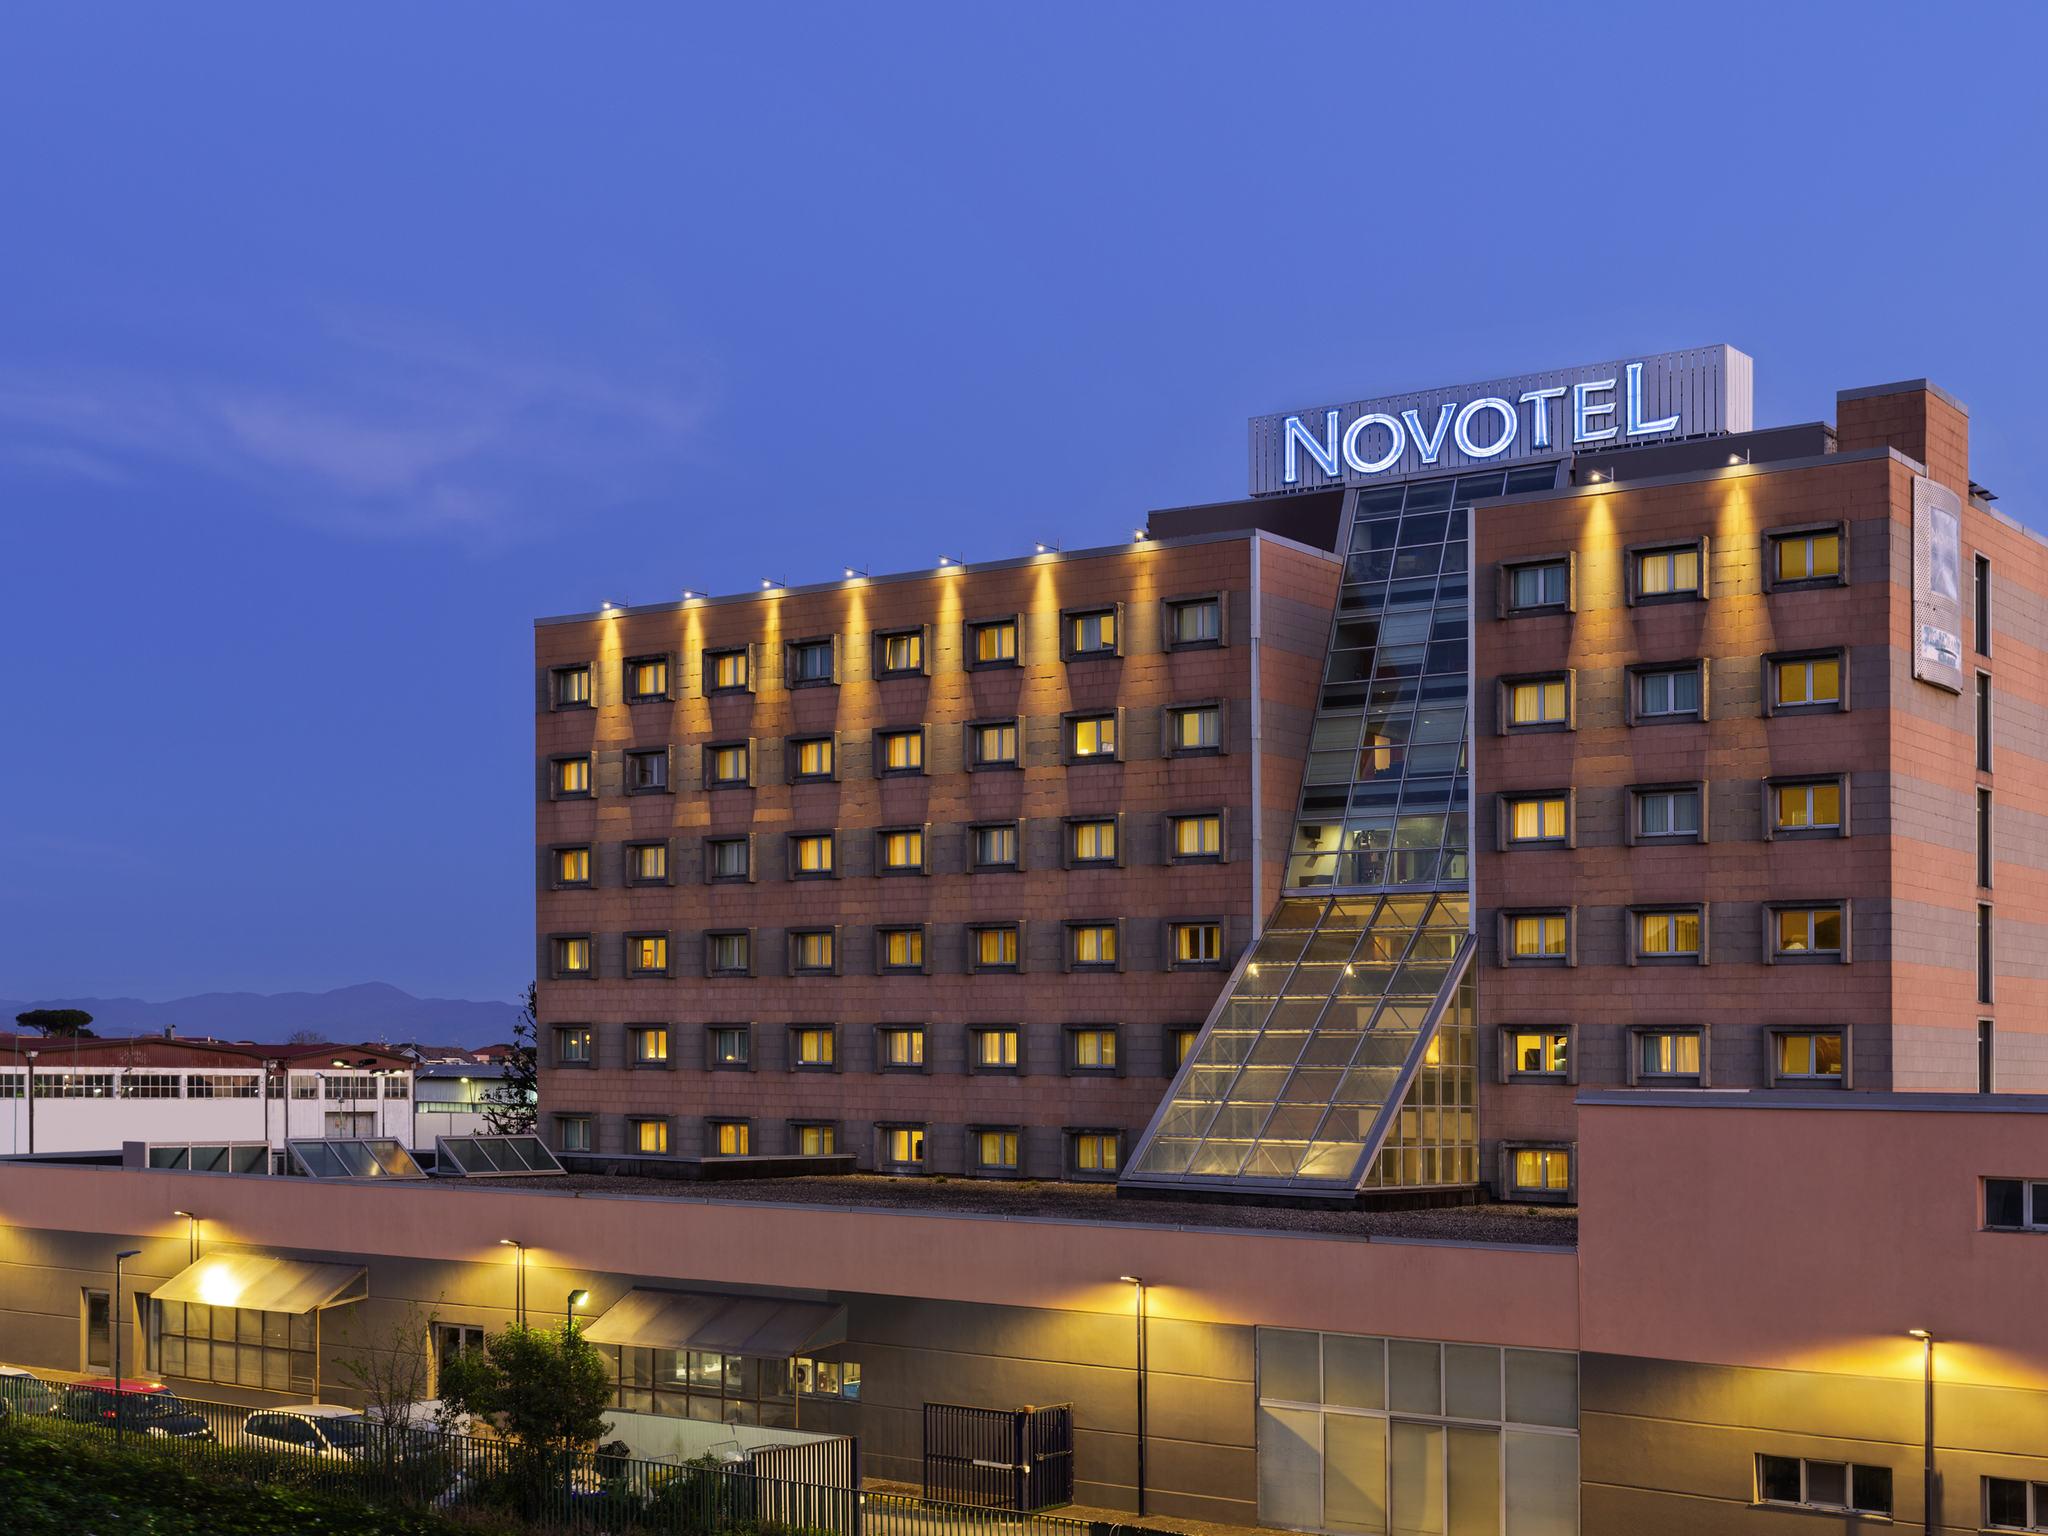 Hotel - Novotel Caserta Sud